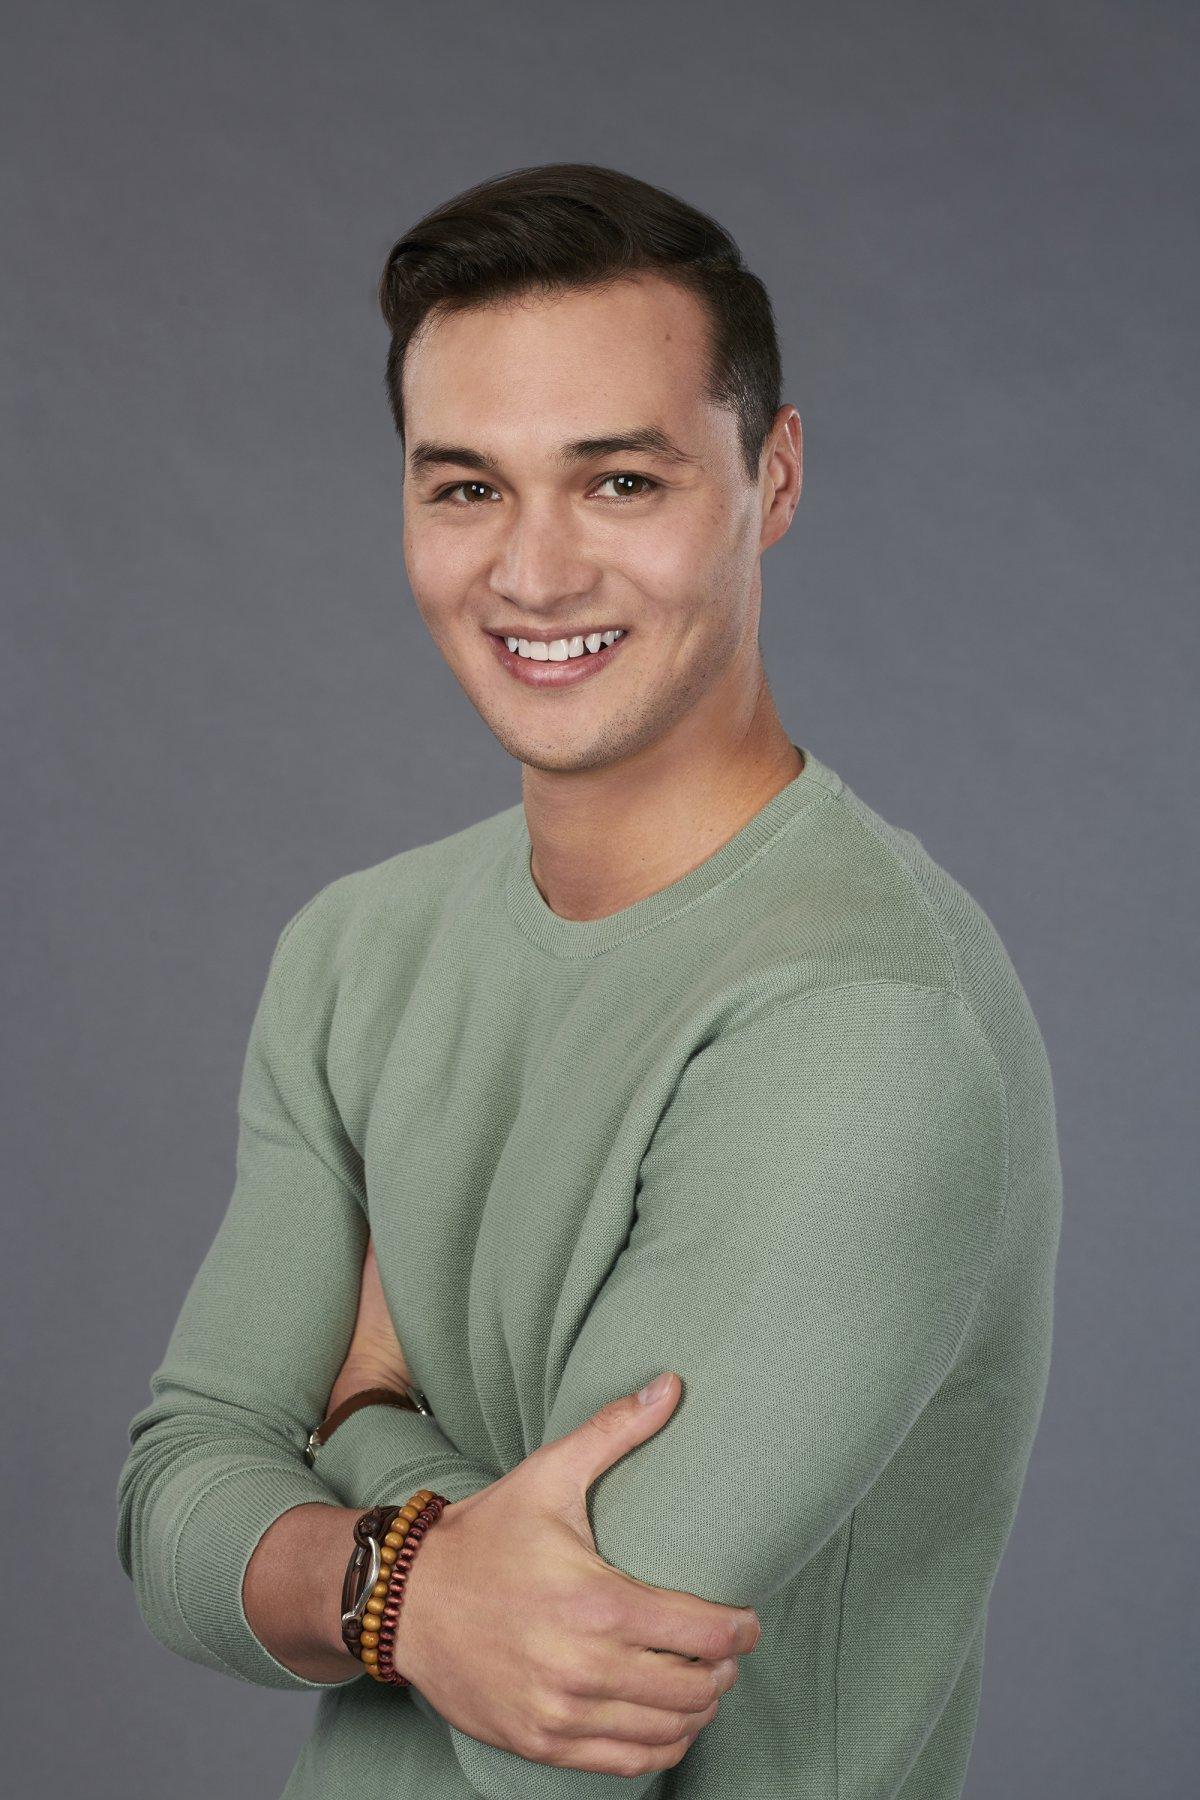 Connor Jenkins